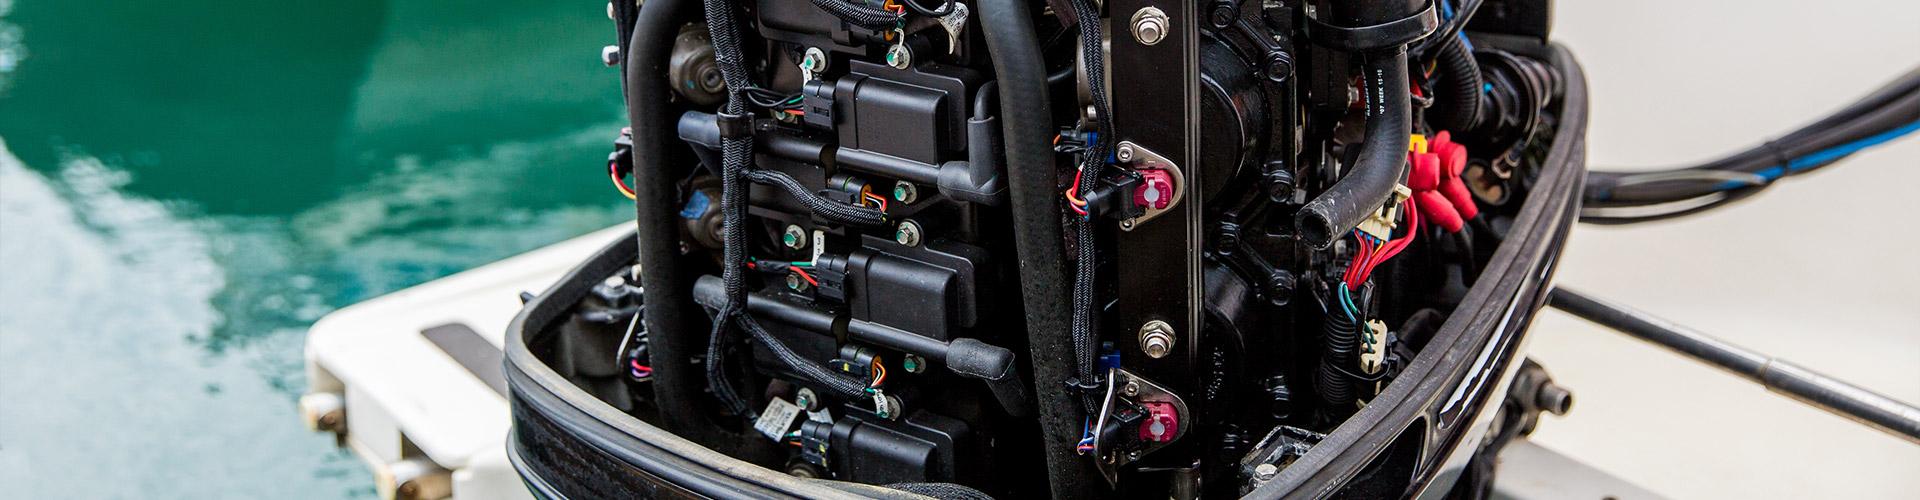 Outboard Engine Servicing, Winterising, Repair & Tuning - Reddish Marine